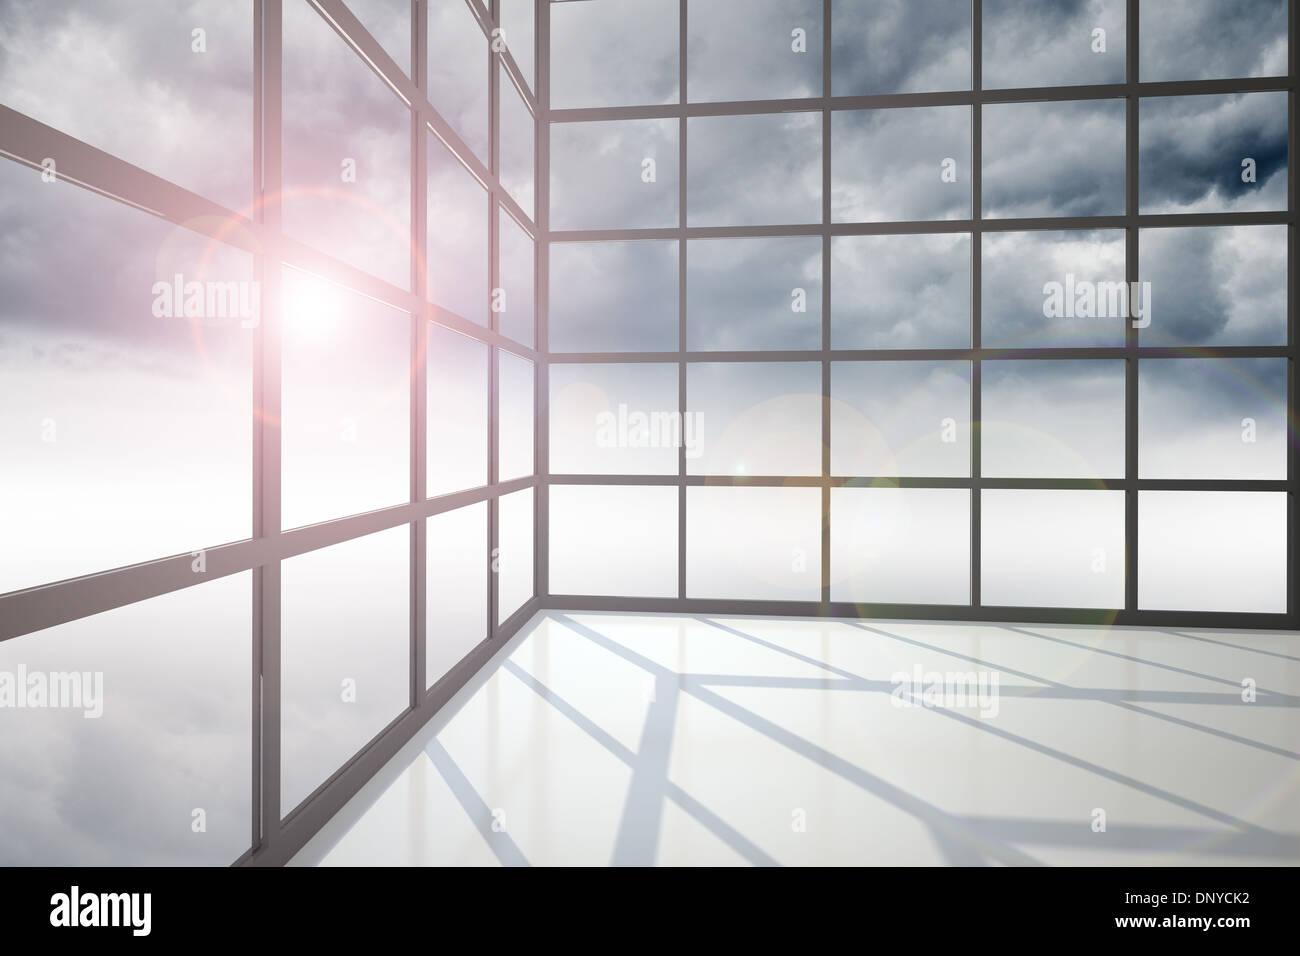 Gloomy sky seen through windows - Stock Image